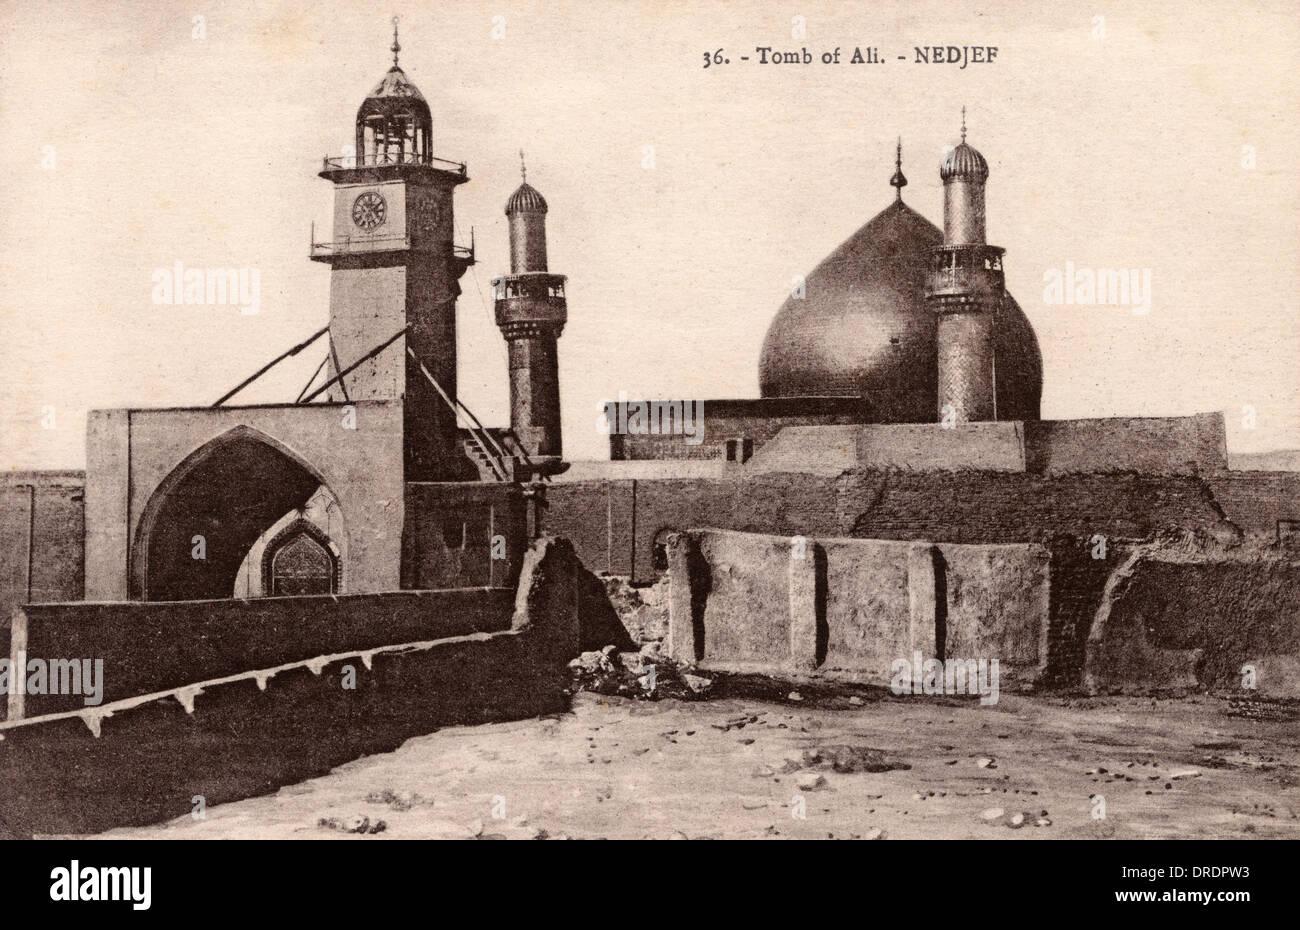 Maula Ali Shrine Wallpaper: Tomb Of Imam Ali, Najaf, Iraq Stock Photo, Royalty Free